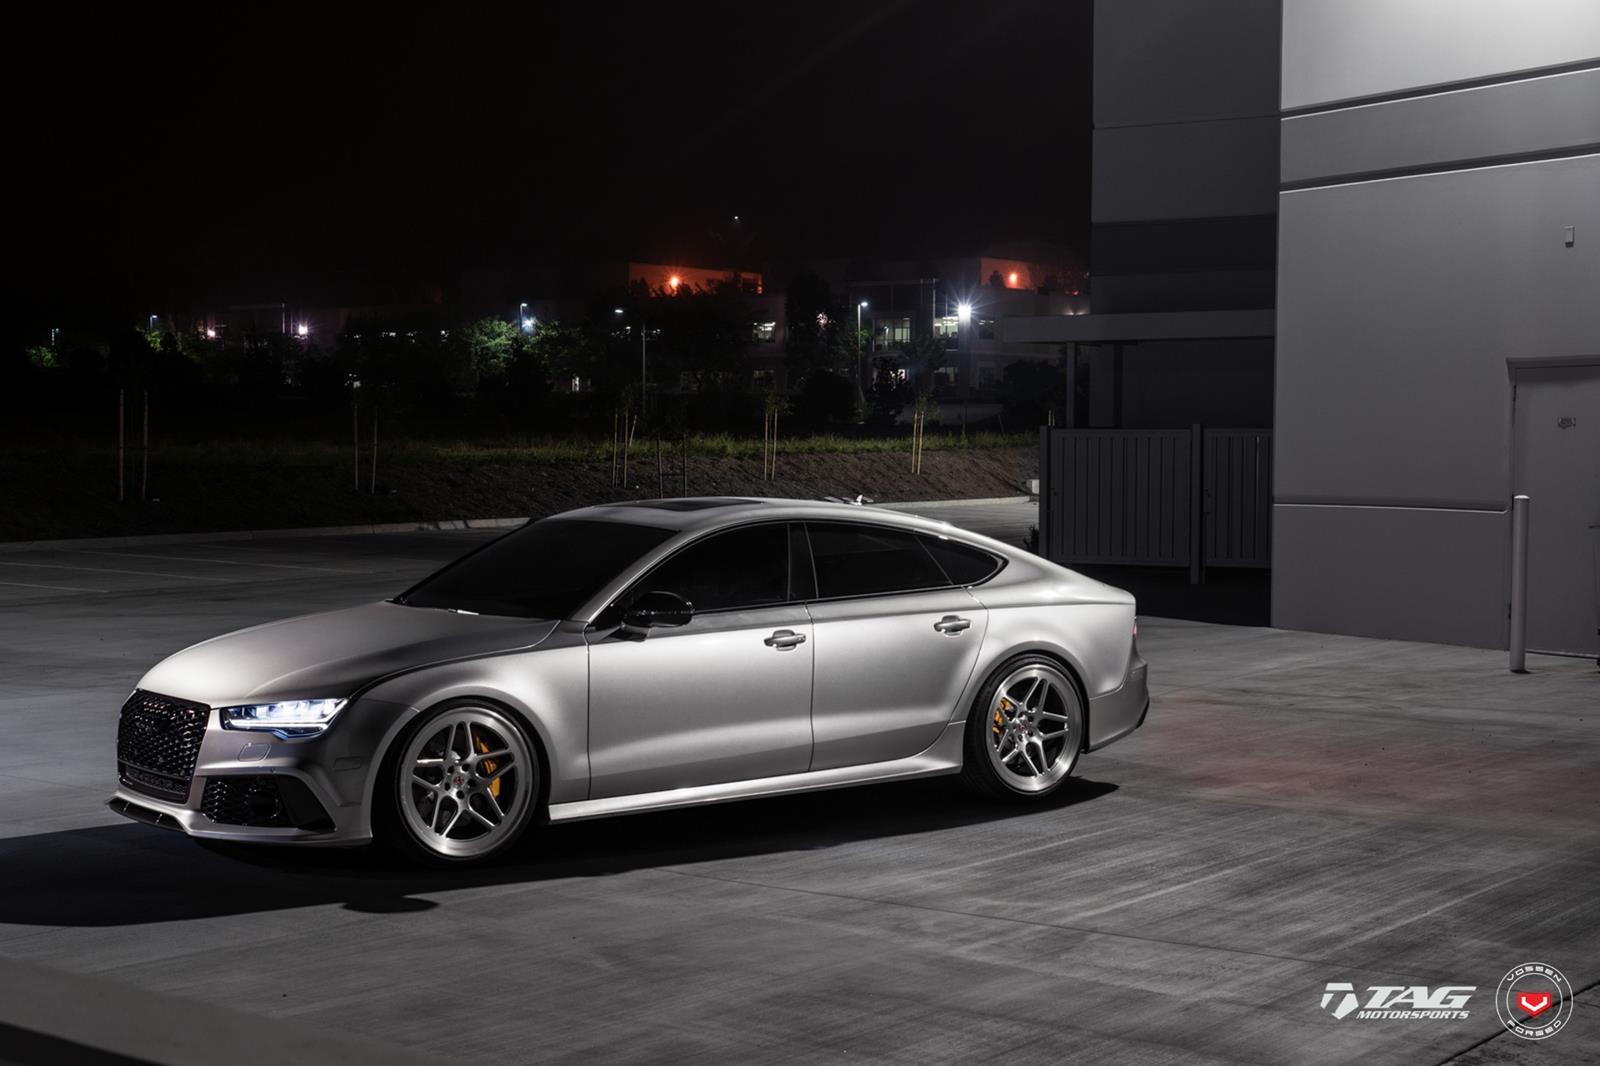 Gray Audi RS7 Sportback on Beast Mode!